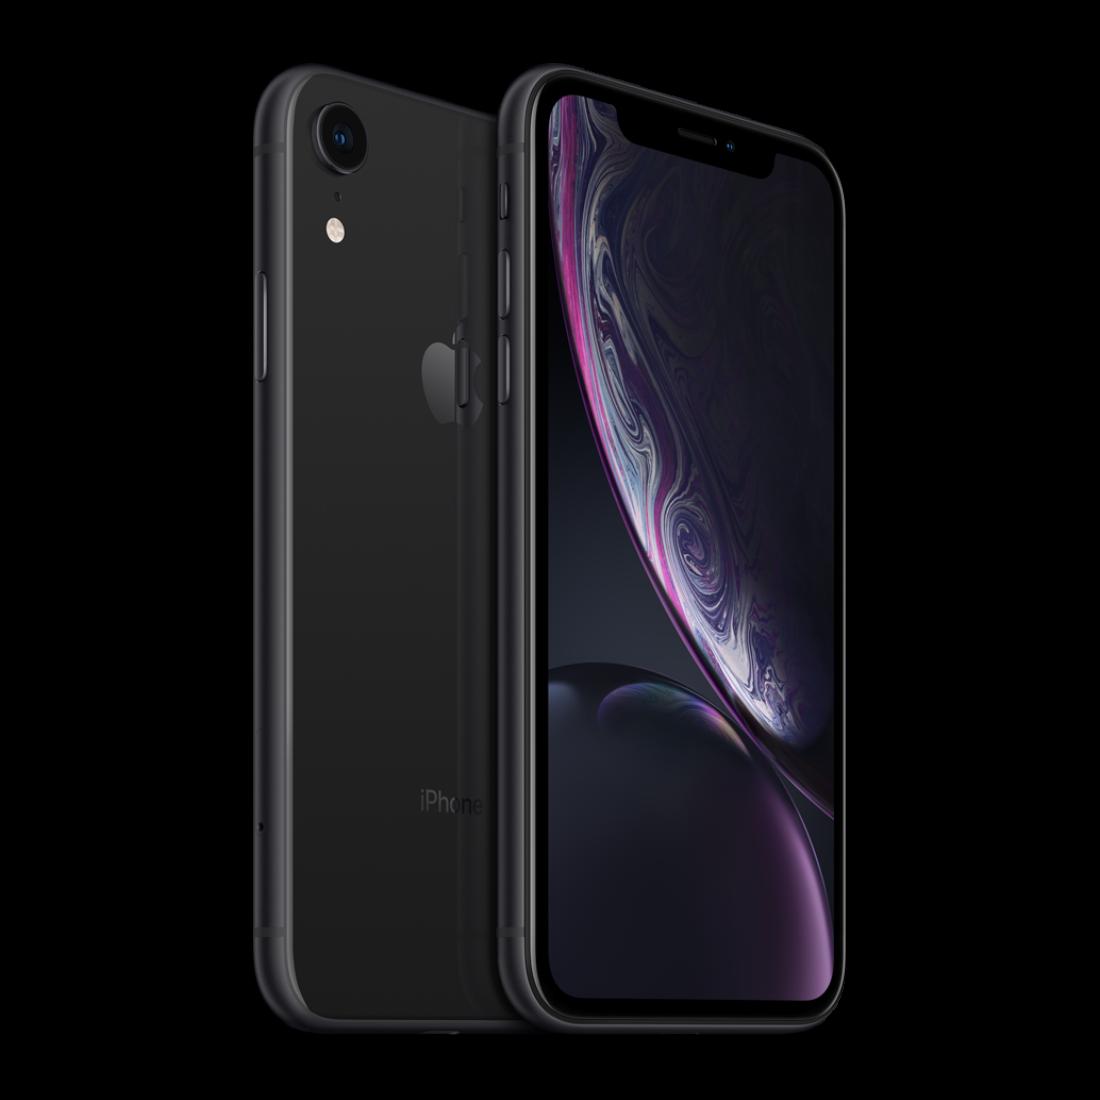 iPhone 12 Mini ou iPhone XR; qual é o melhor?